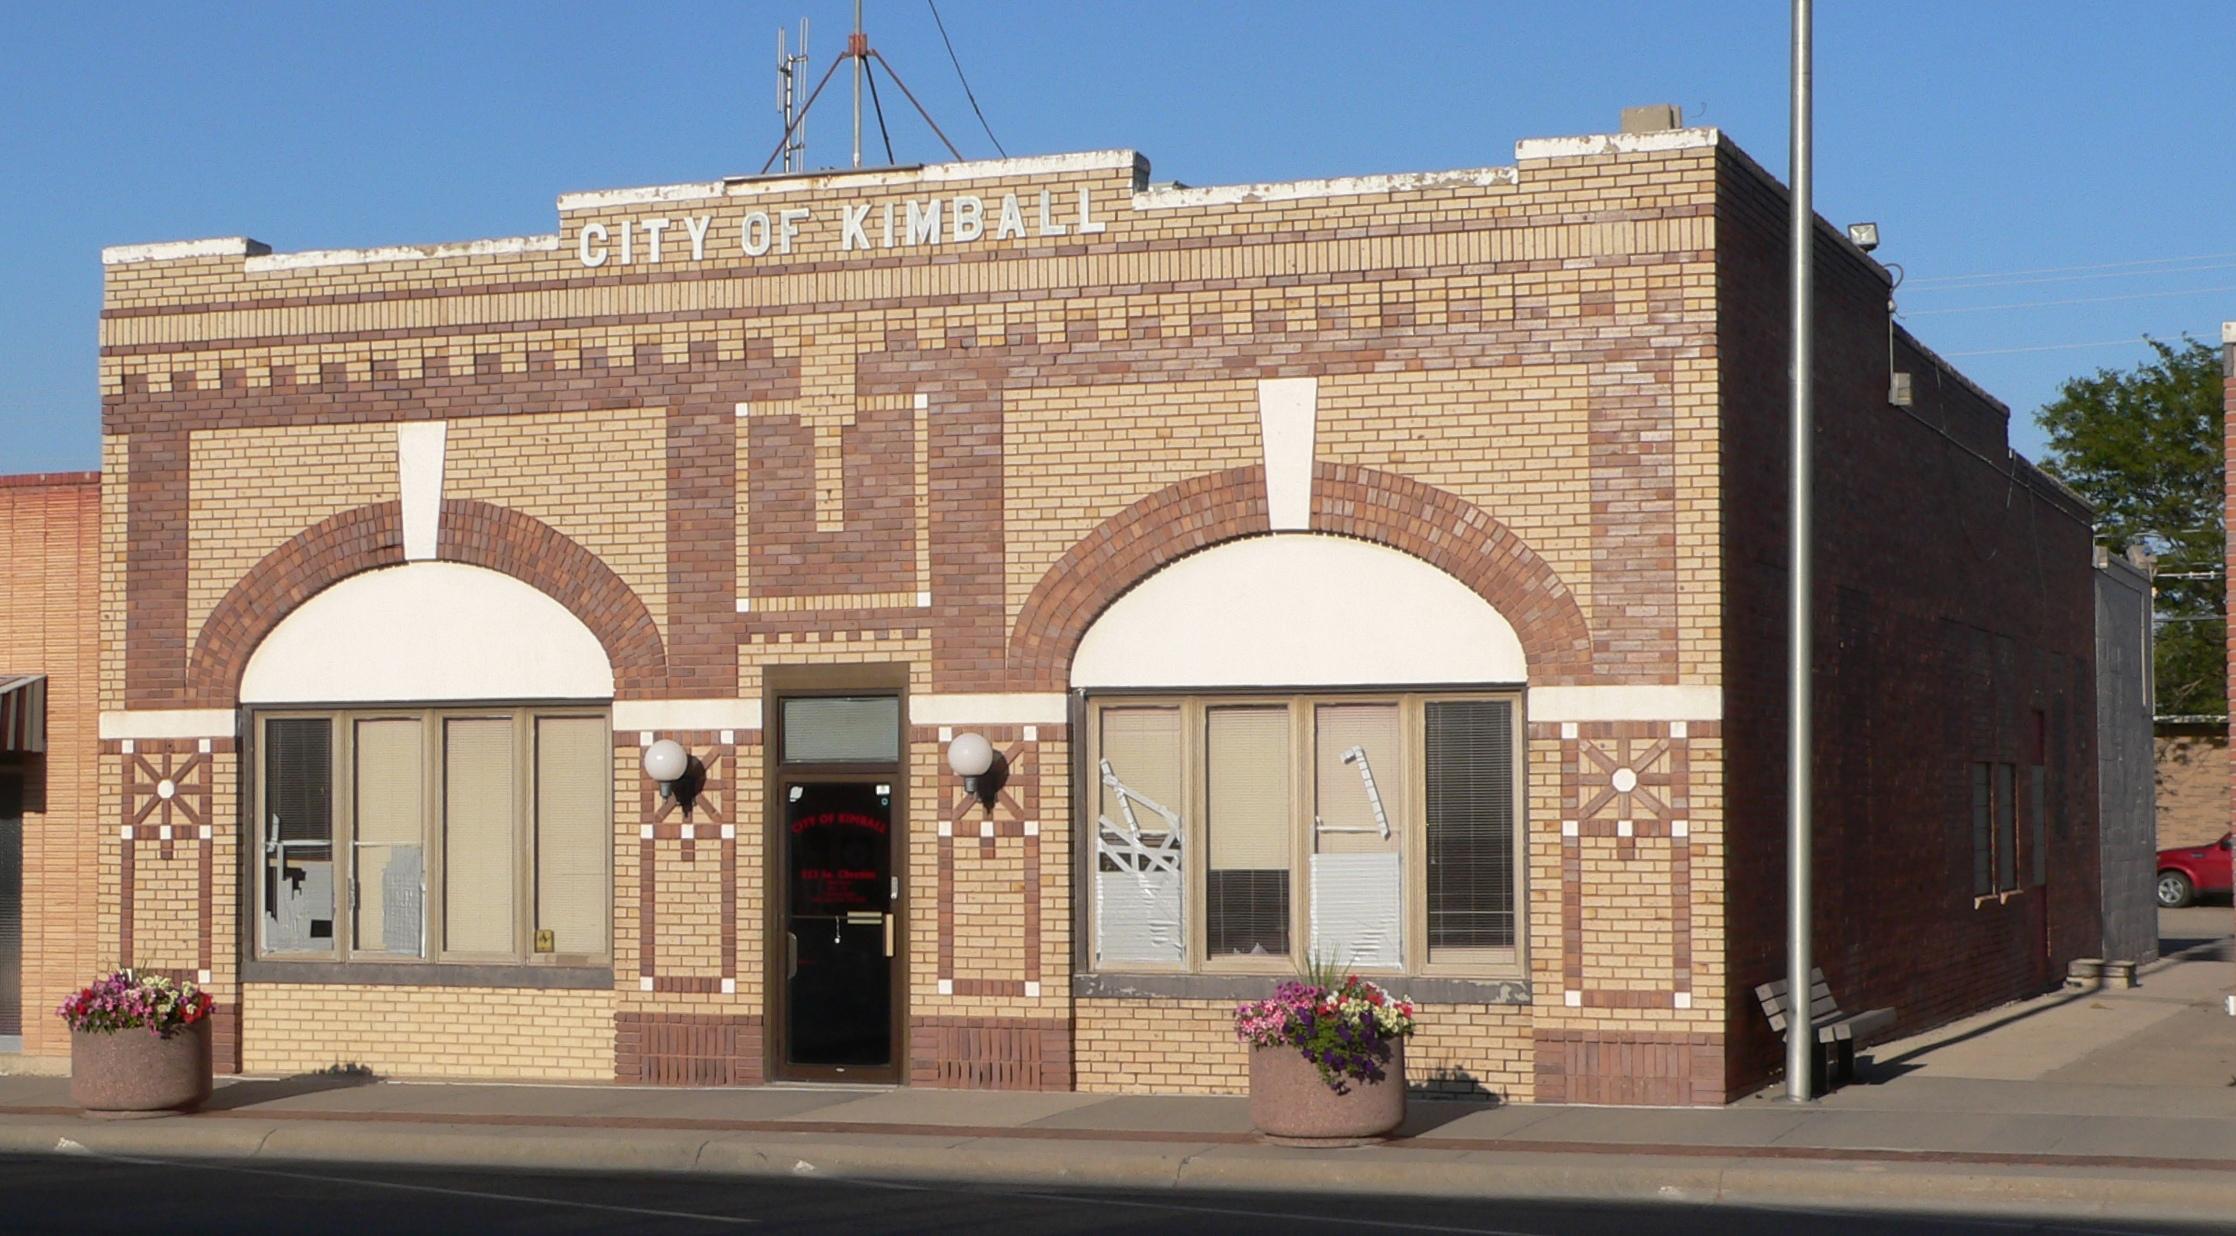 Kimball (Nebraska)